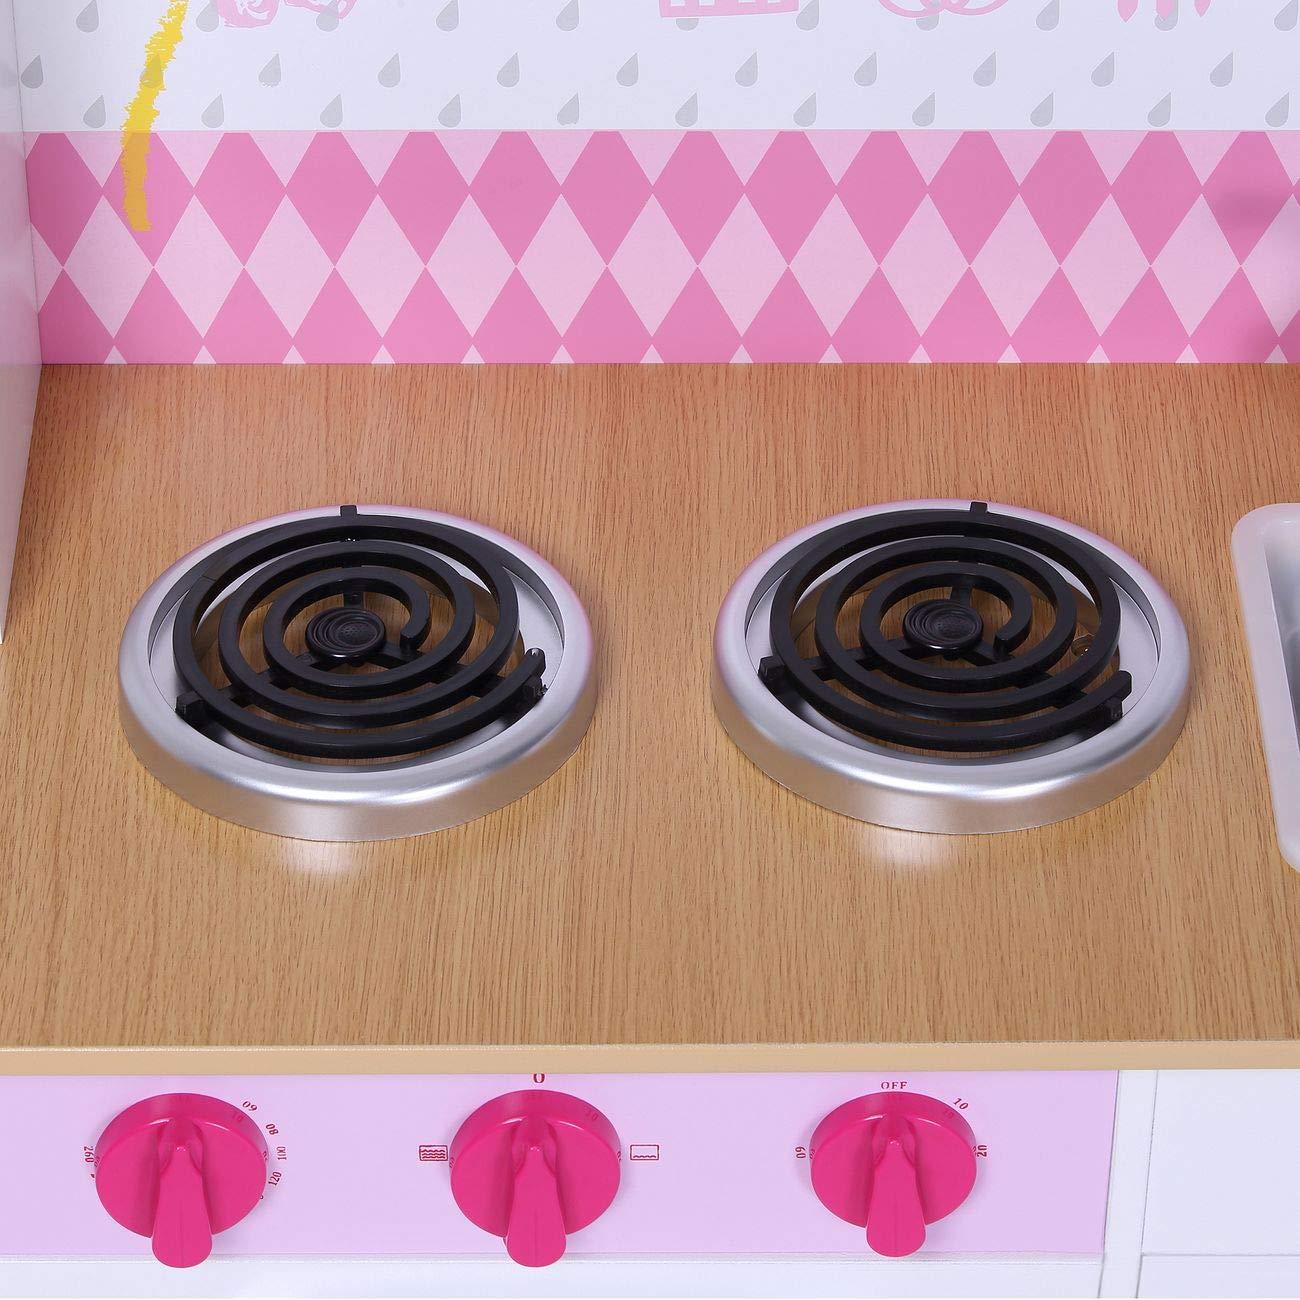 Baby Vivo Vivo Vivo Kinderküche Spielküche aus Holz Kinderspielküche Küche Holzküche Spielzeugküche - Romy in Weiß 373b61